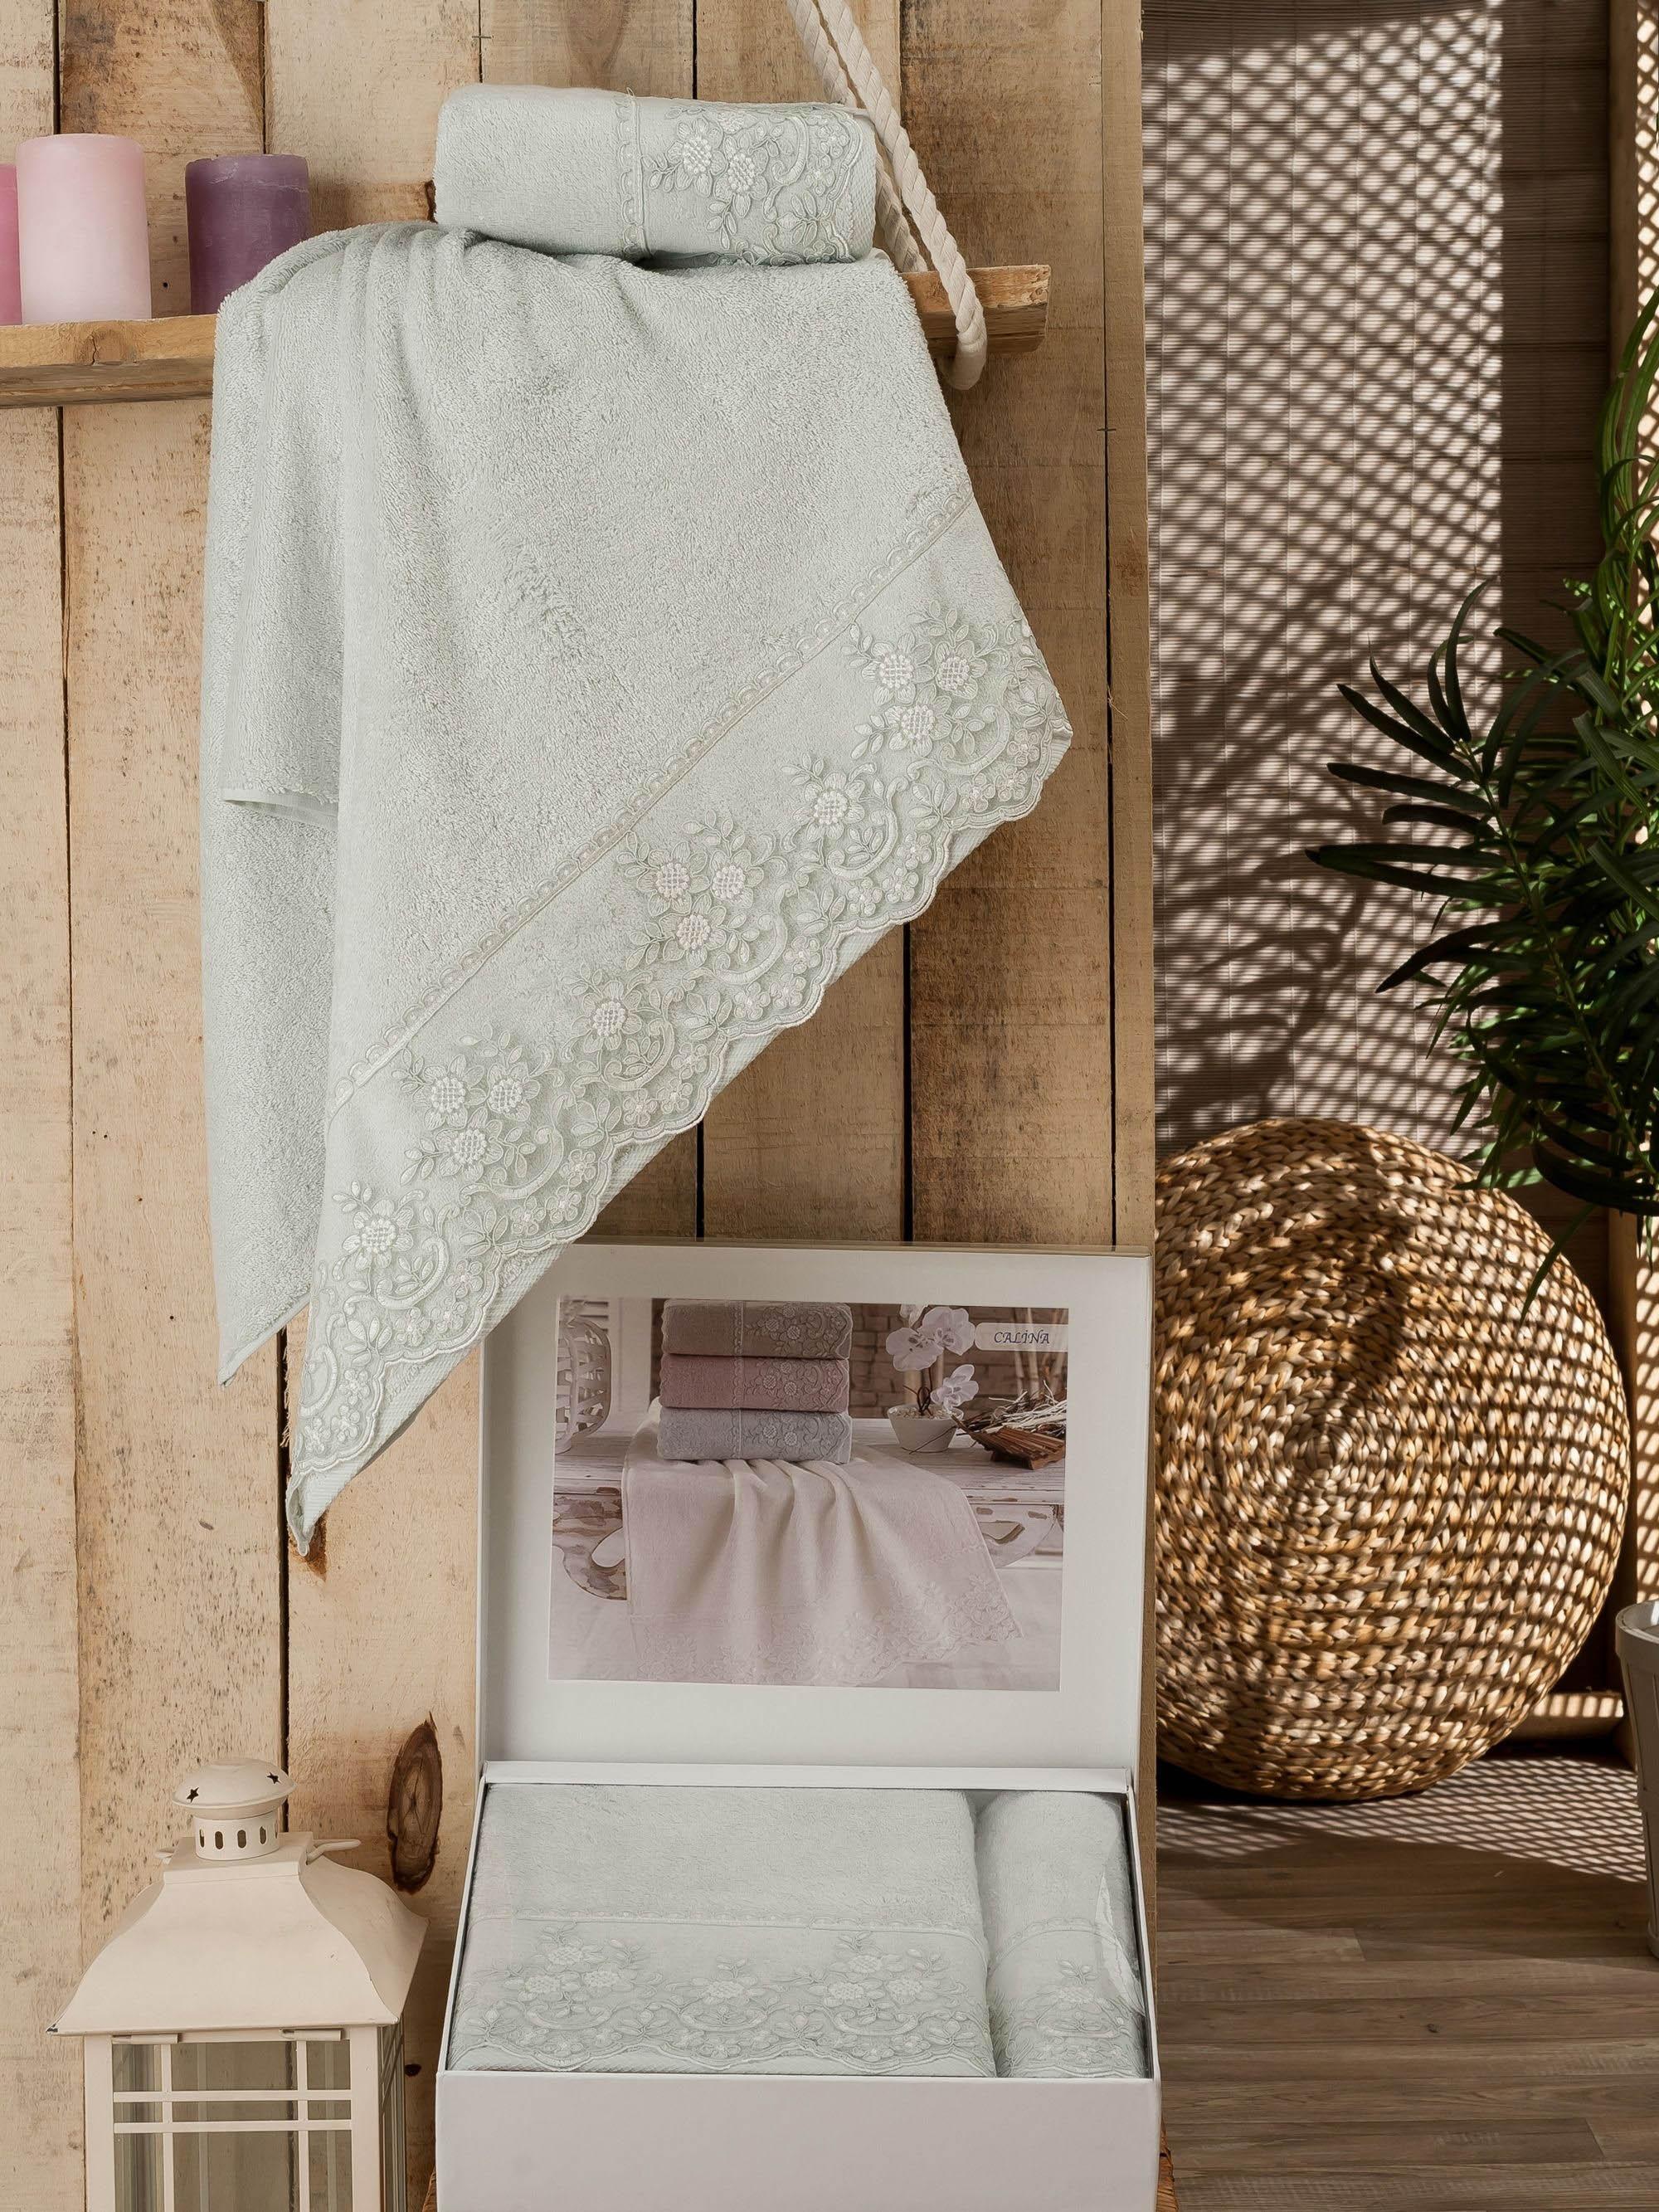 Полотенца DO'n'CO Полотенце Calina Цвет: Мятный (Набор) полотенце набор бамбук 903813